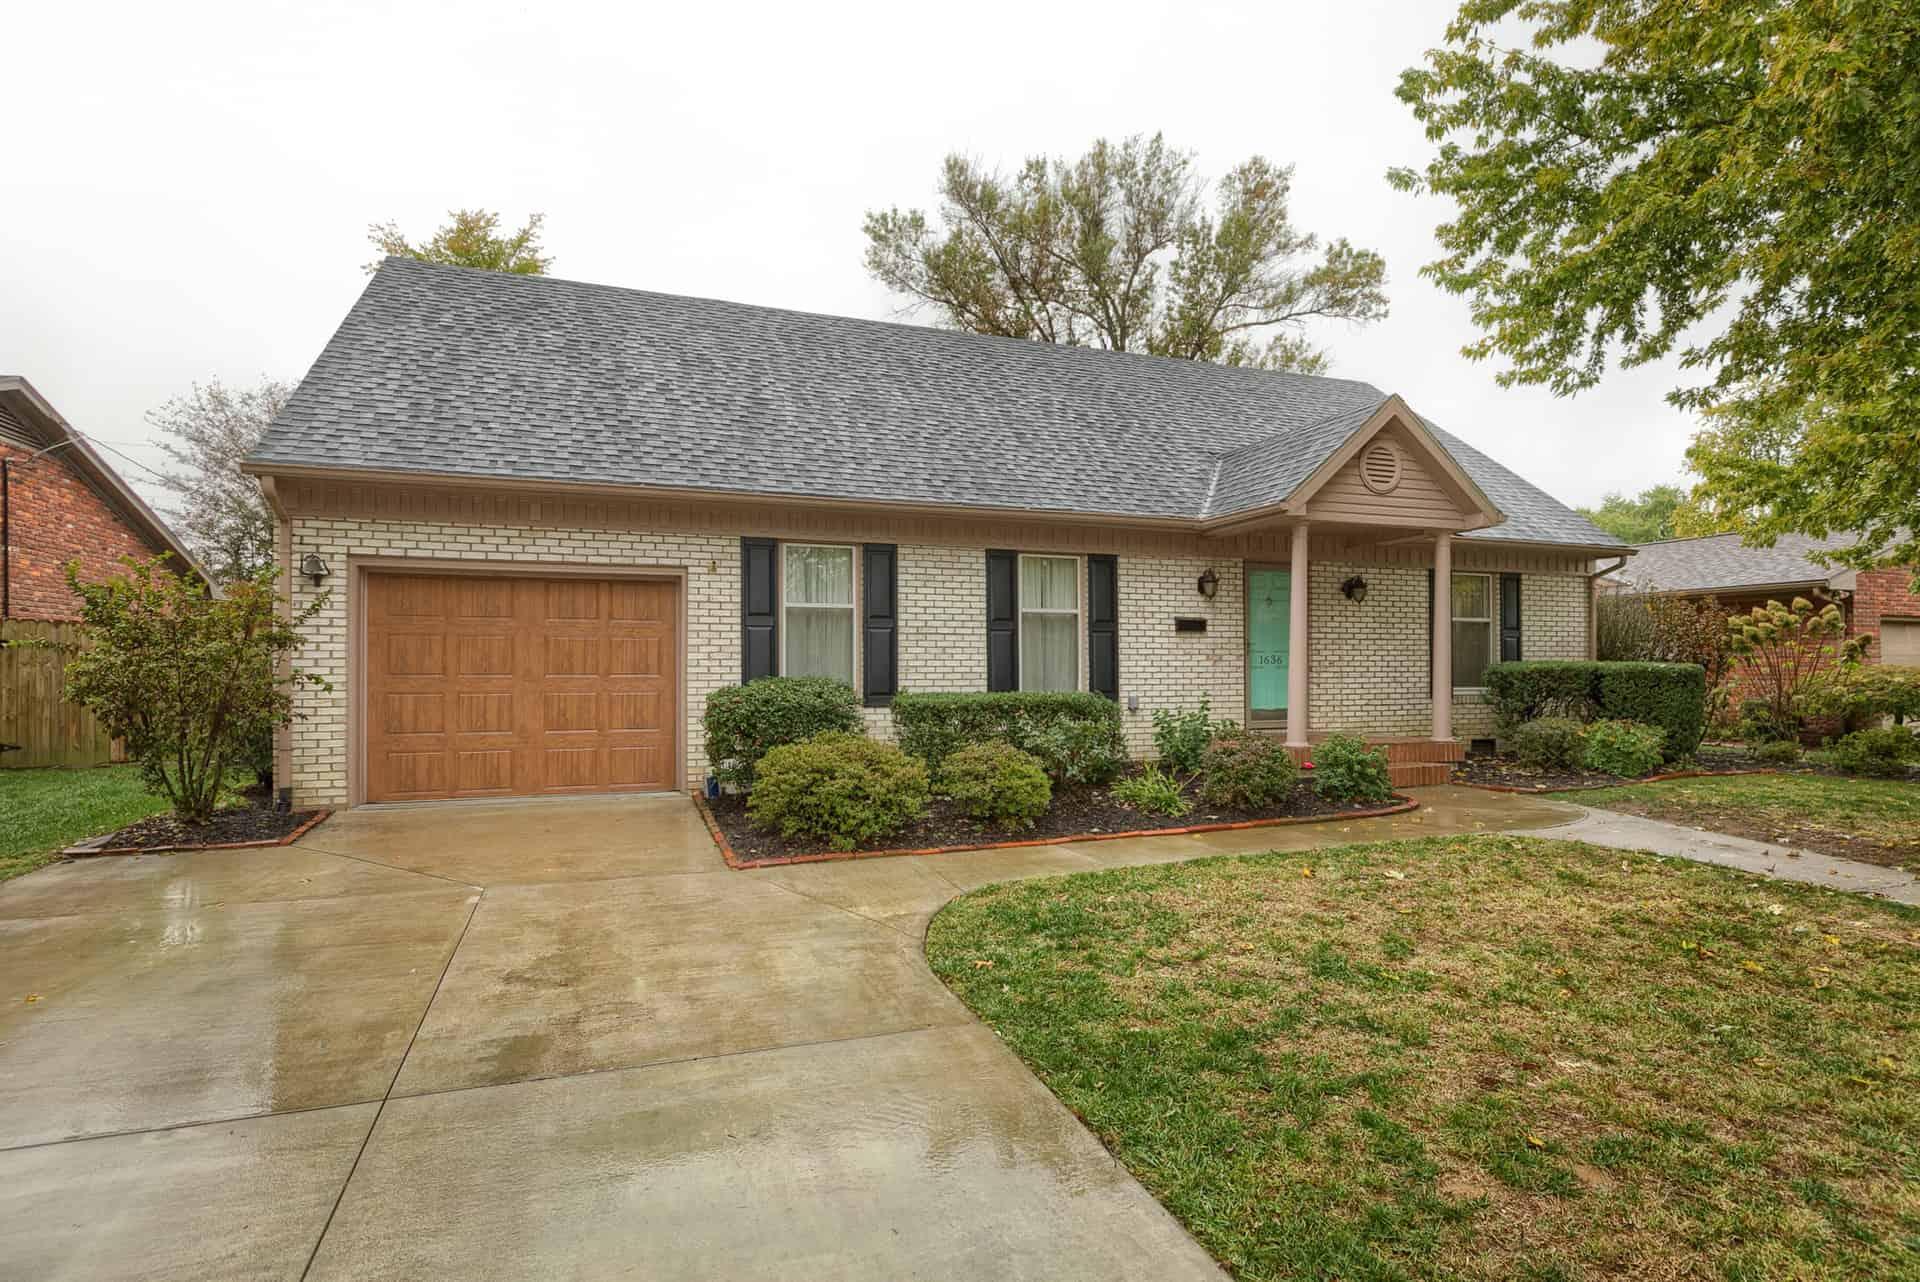 1636 Forrest Lane, Owensboro, KY 42301